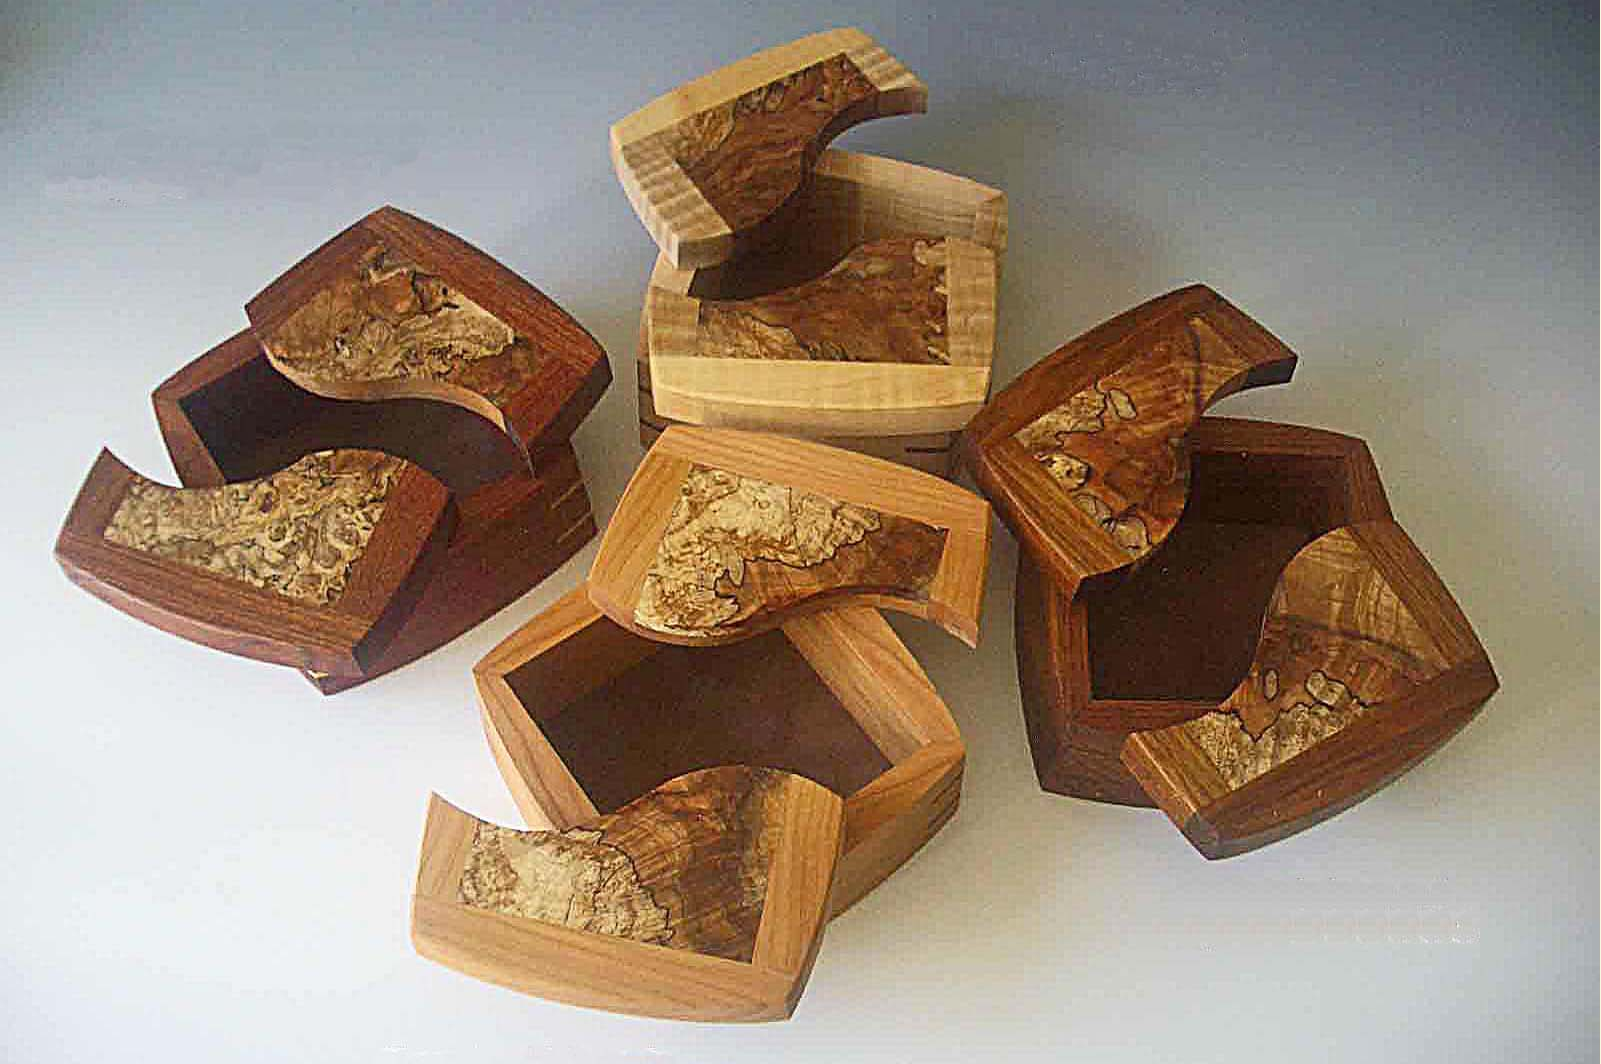 Making Tiny Decorative Christmas Boxes